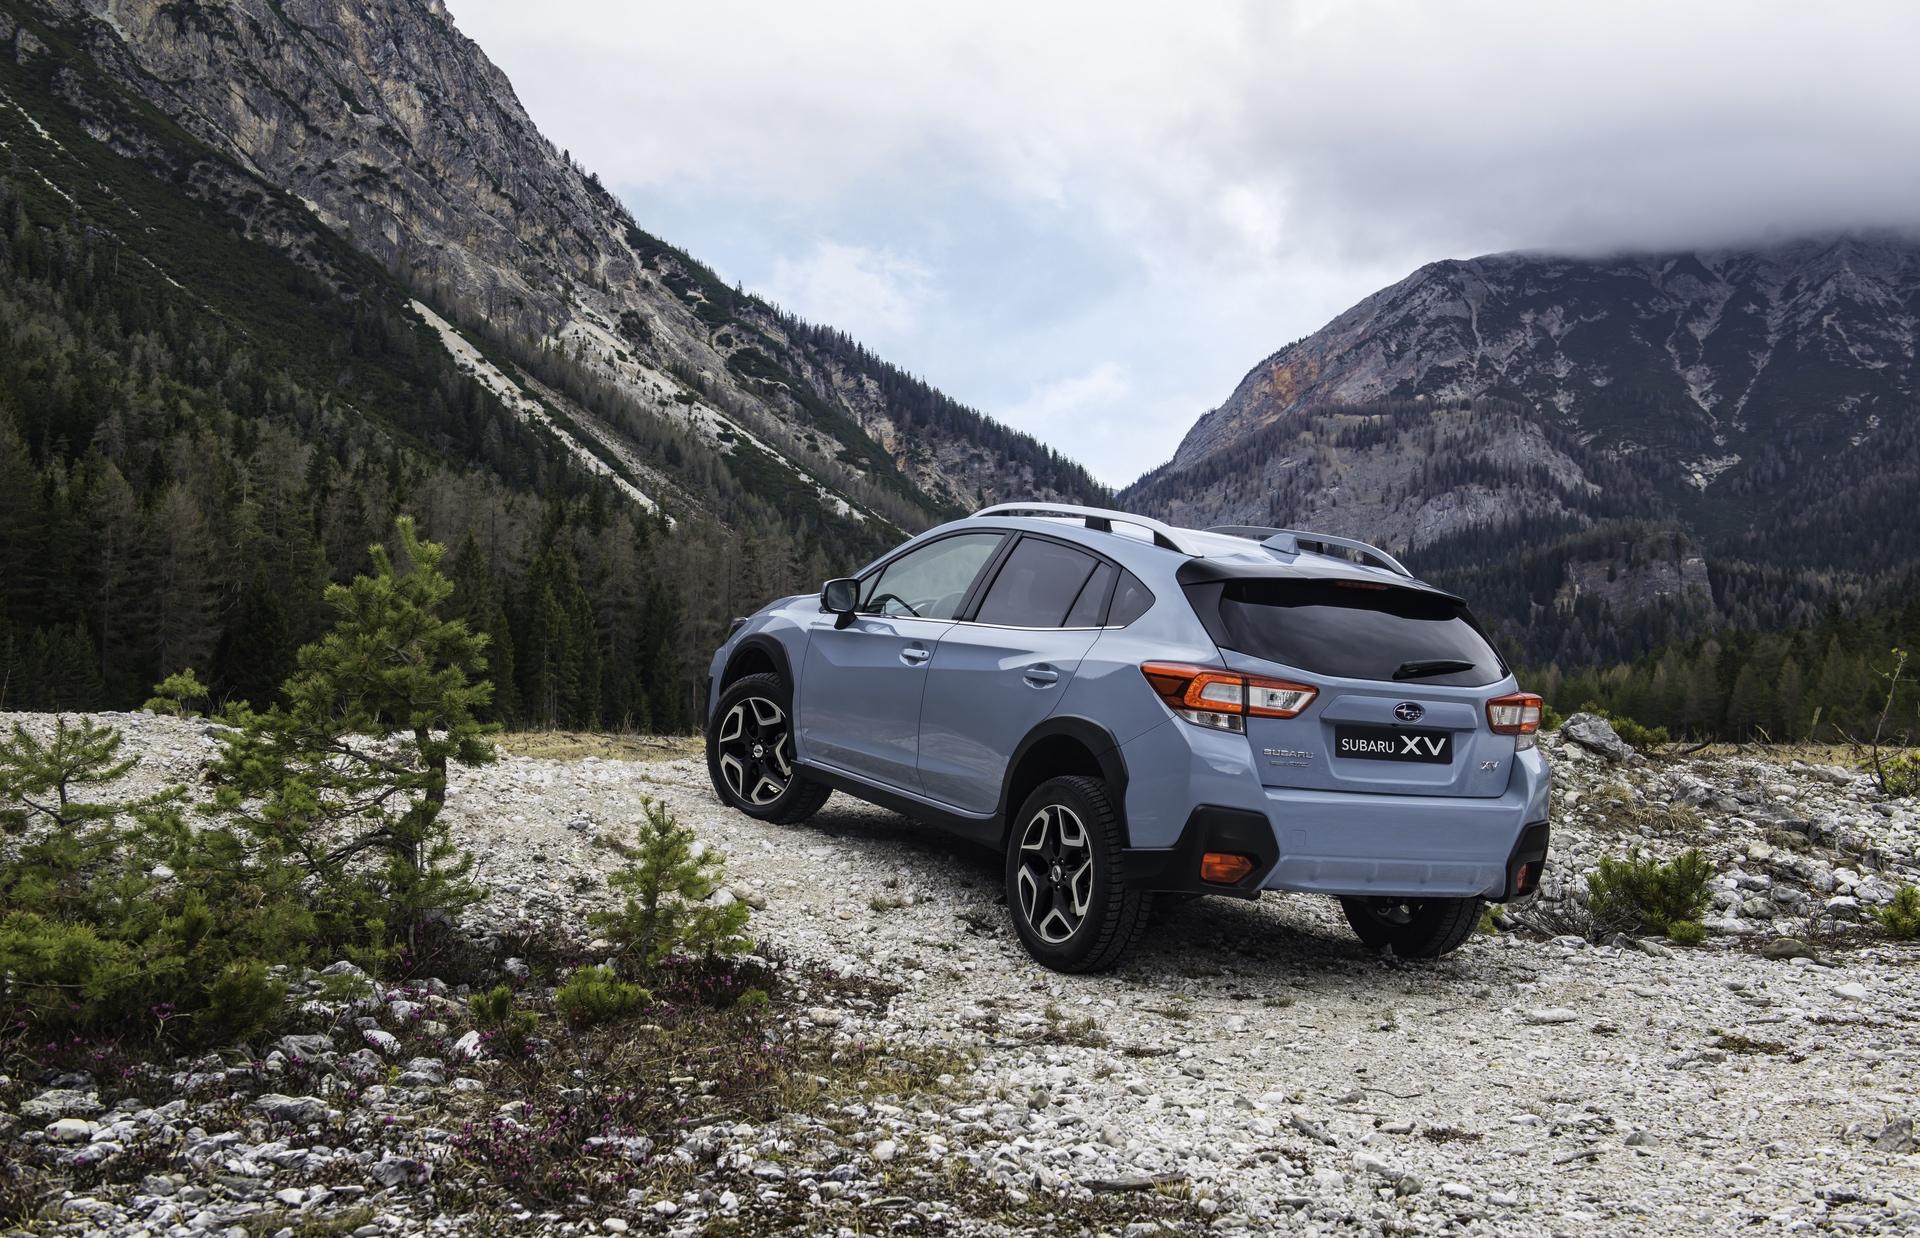 First_Drive_Subaru_XV_0032